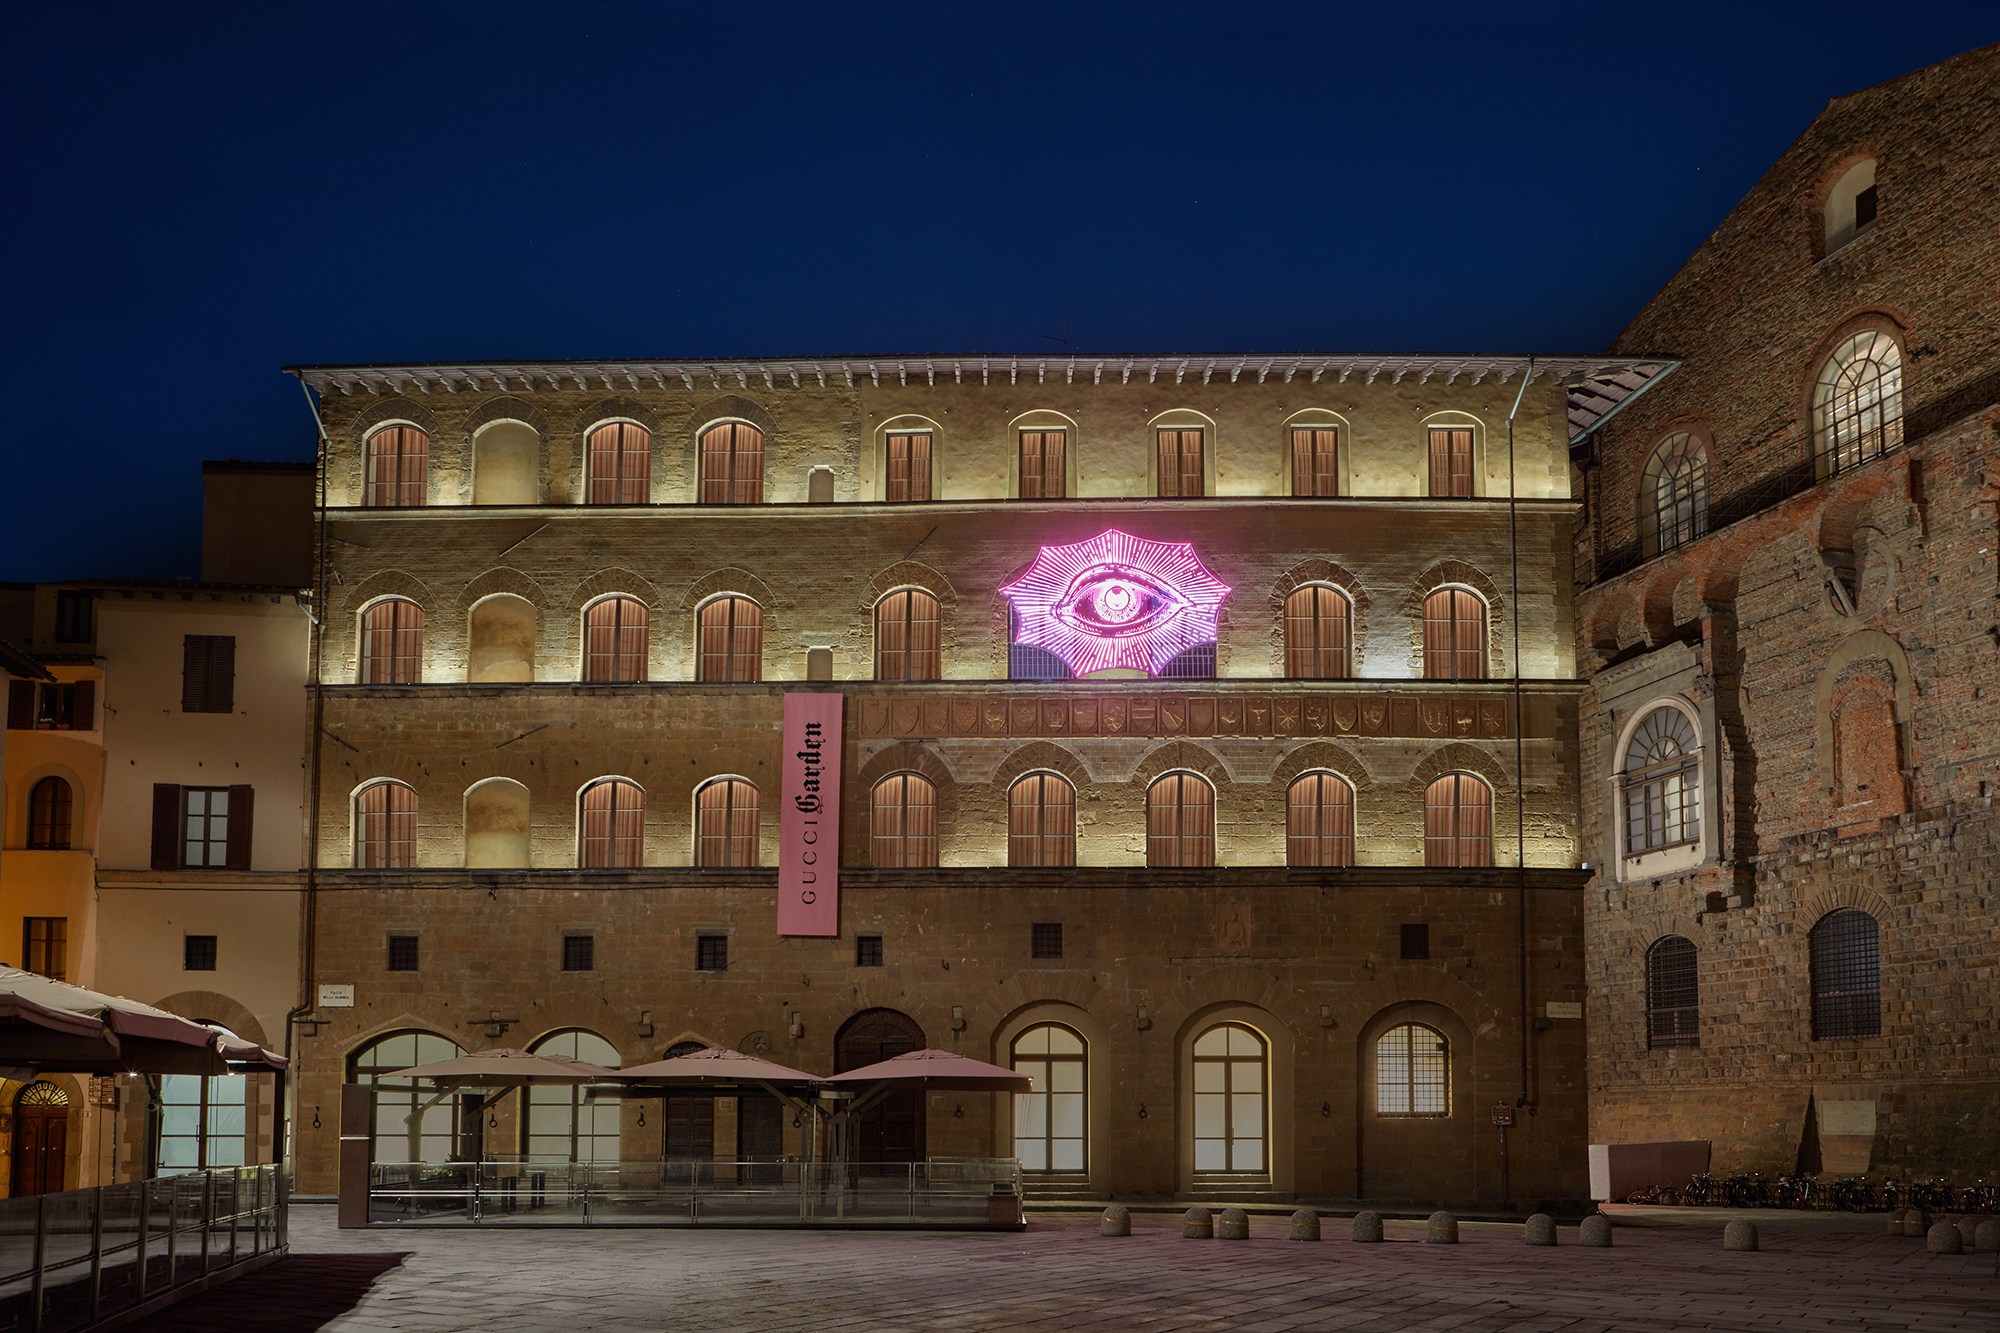 810d94839 O Gucci Garden, junto à Piazza della Signoria,em Florença